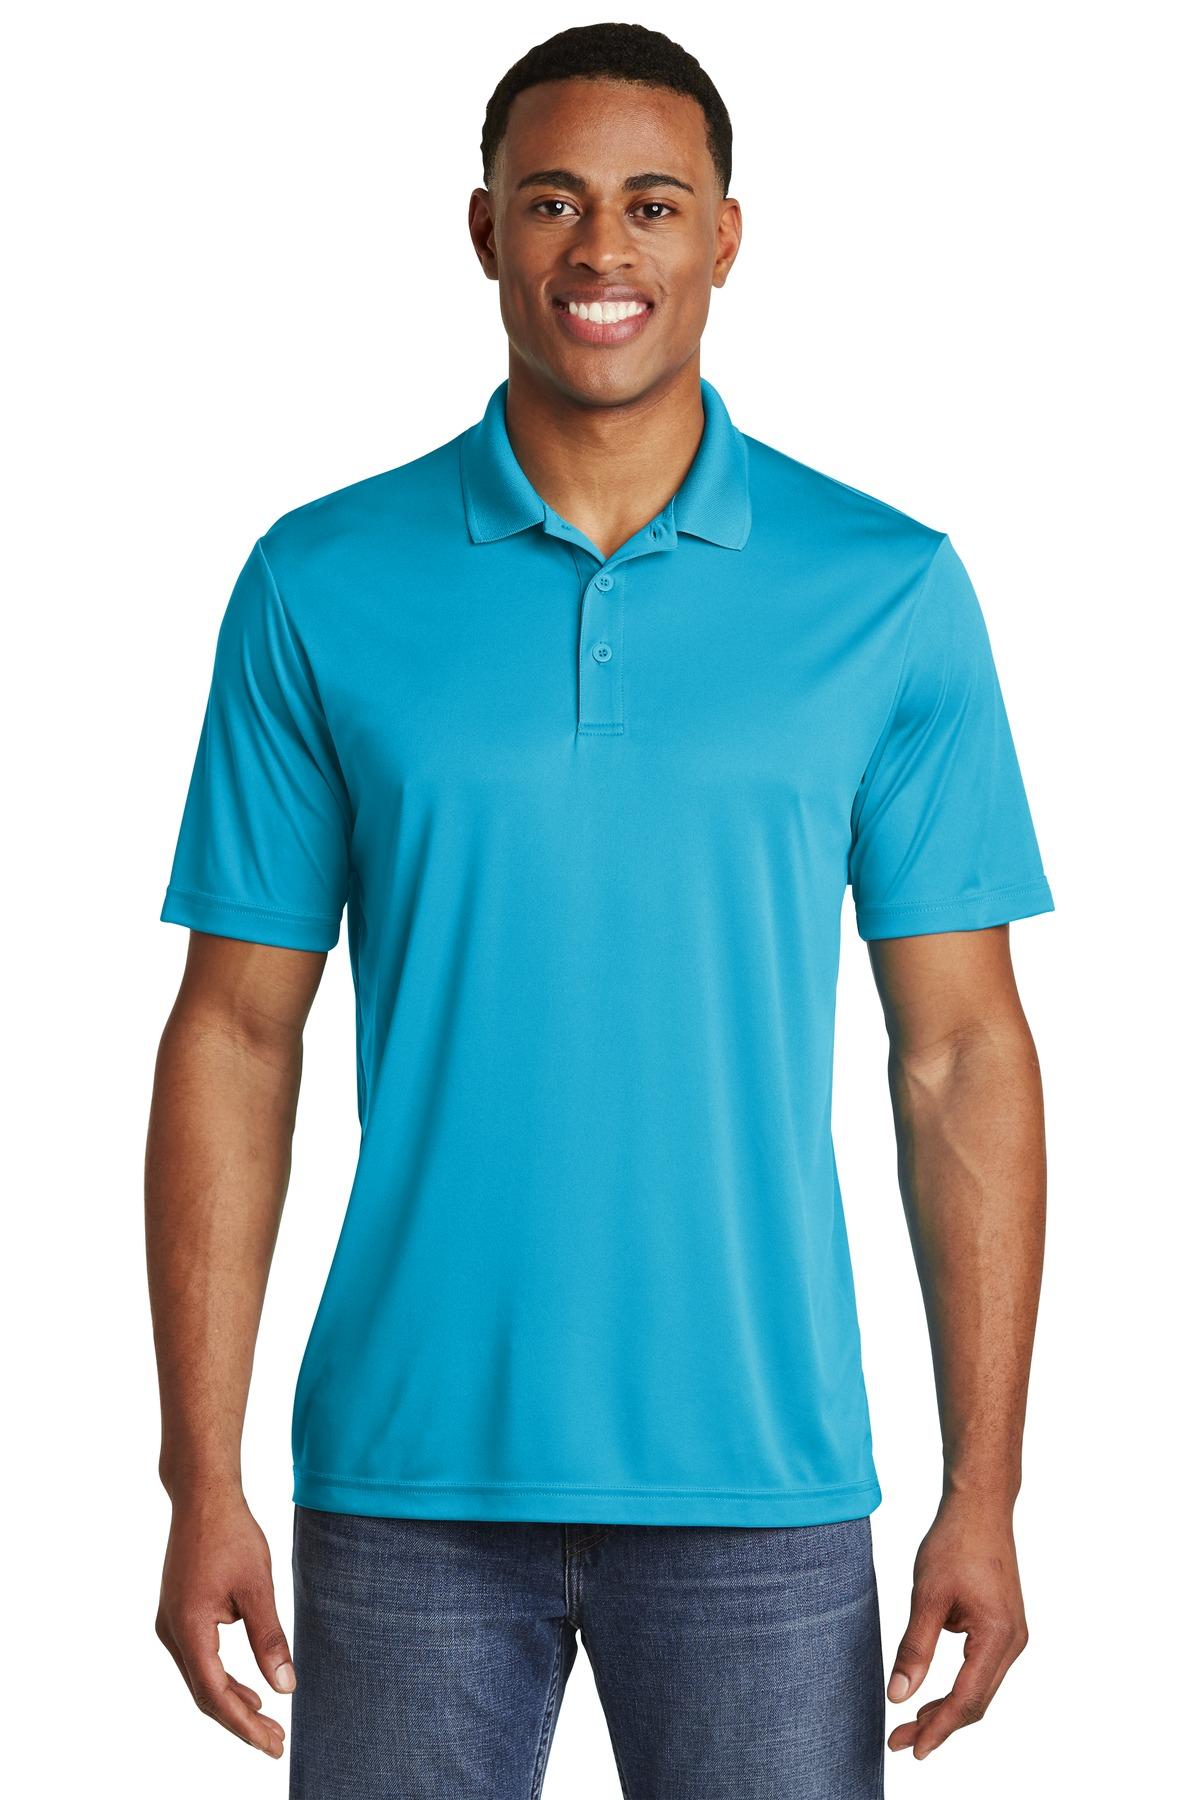 Buy Sport Tek Posicharge Competitor Polo Sport Tek Online At Best Price Ut Posicharge technology helps colors and logos stay vibrant longer. bizwear inc